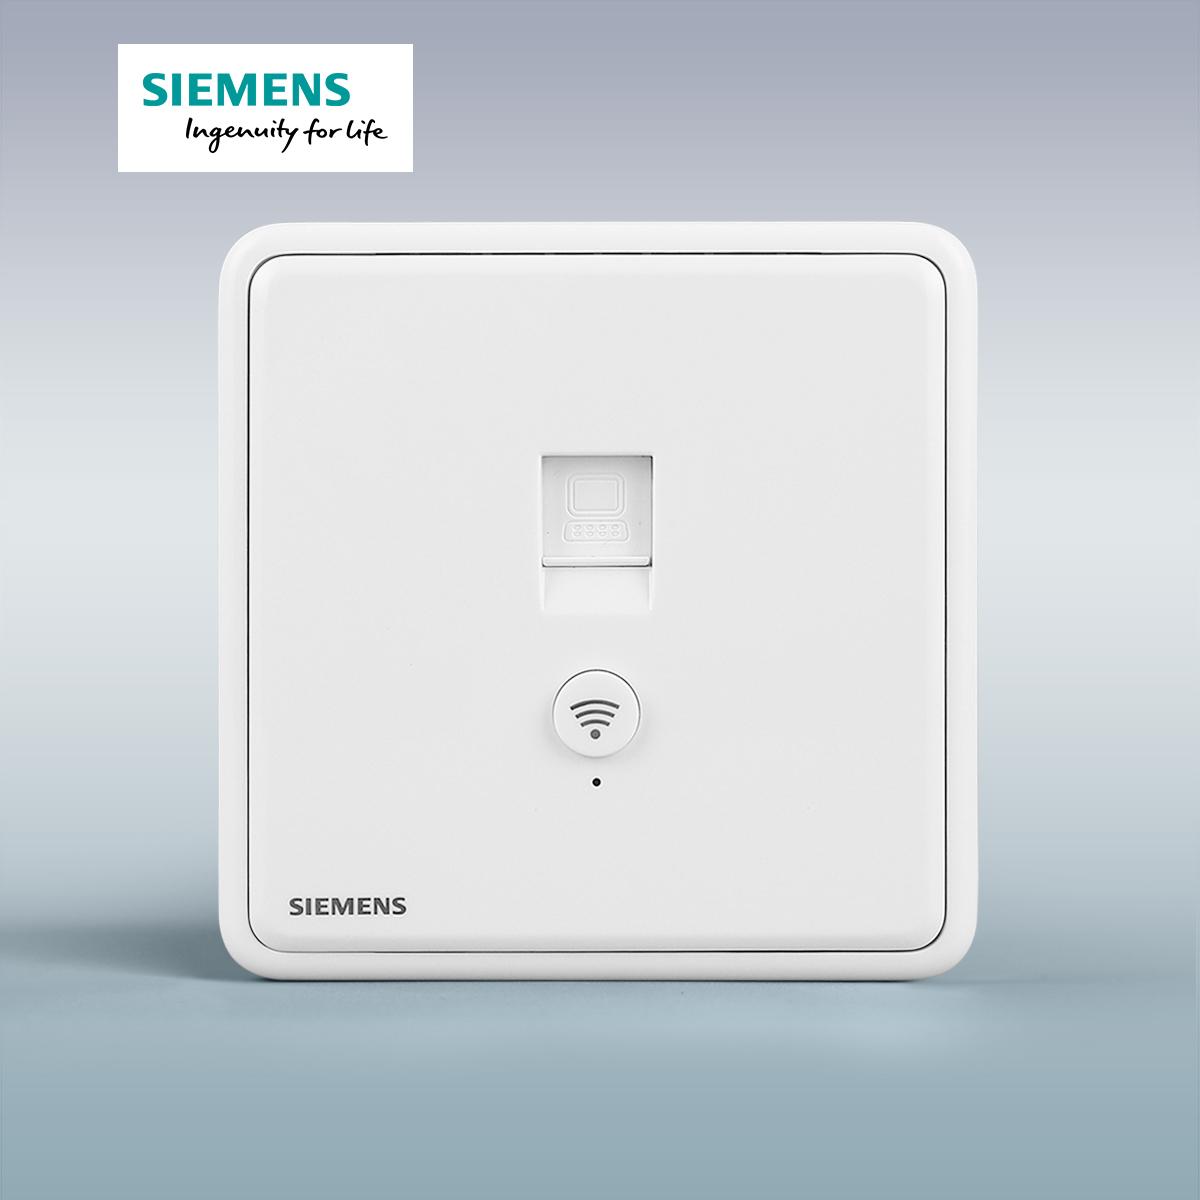 Siemens AP panel WiFi signal transmitter wireless router intelligent computer socket 86 embedded